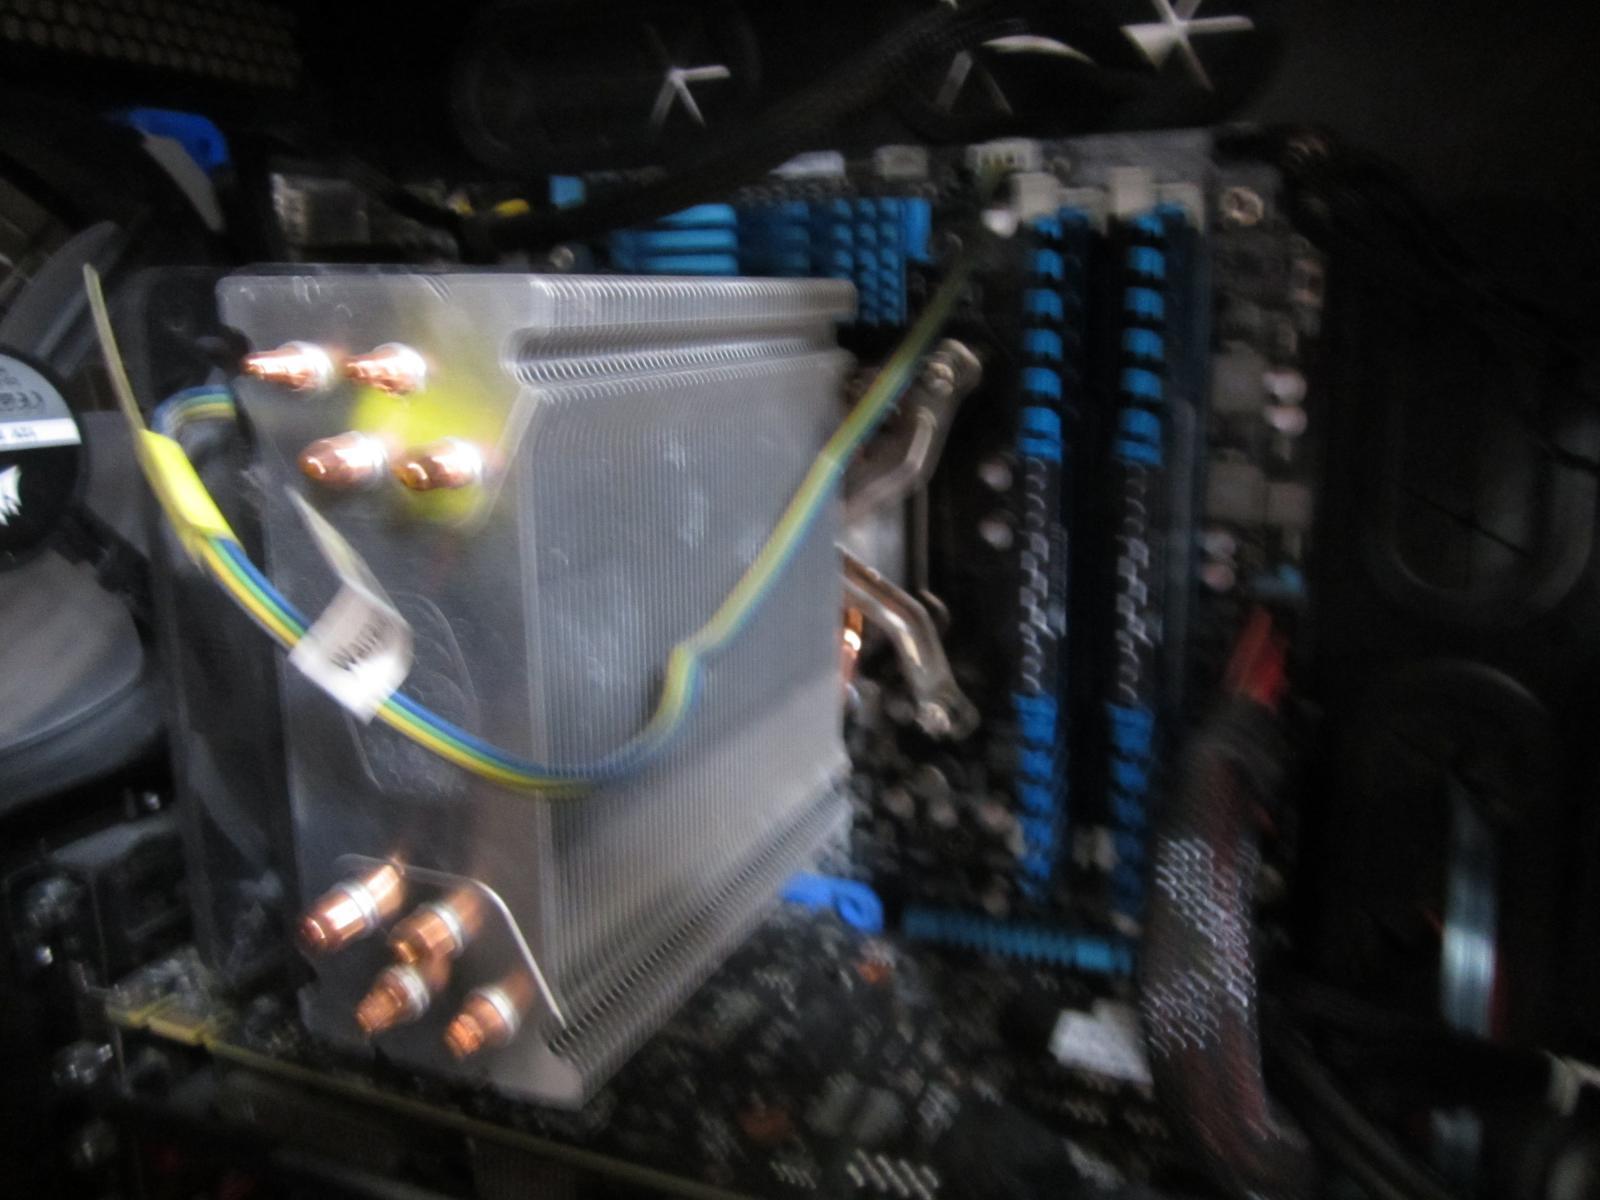 Photo of i5-2500k Bare Bones System (CPU+Cooler/MB/Memory)